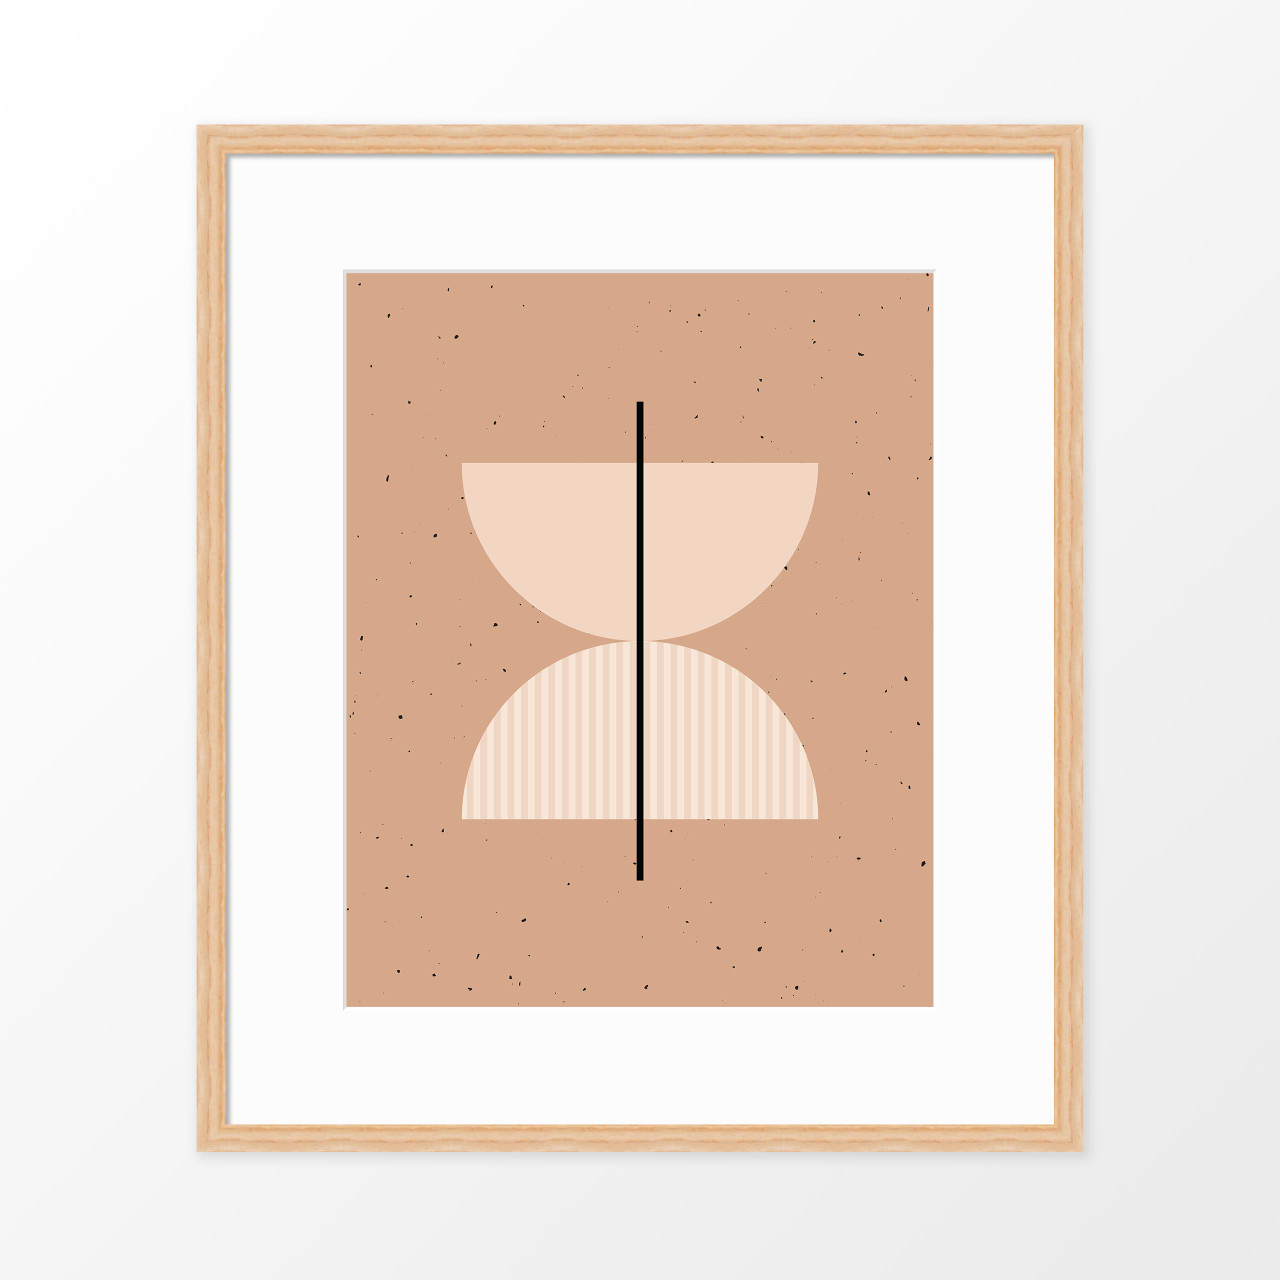 'Half Circles II' Minimalist Geometric Art Print from The Printed Home